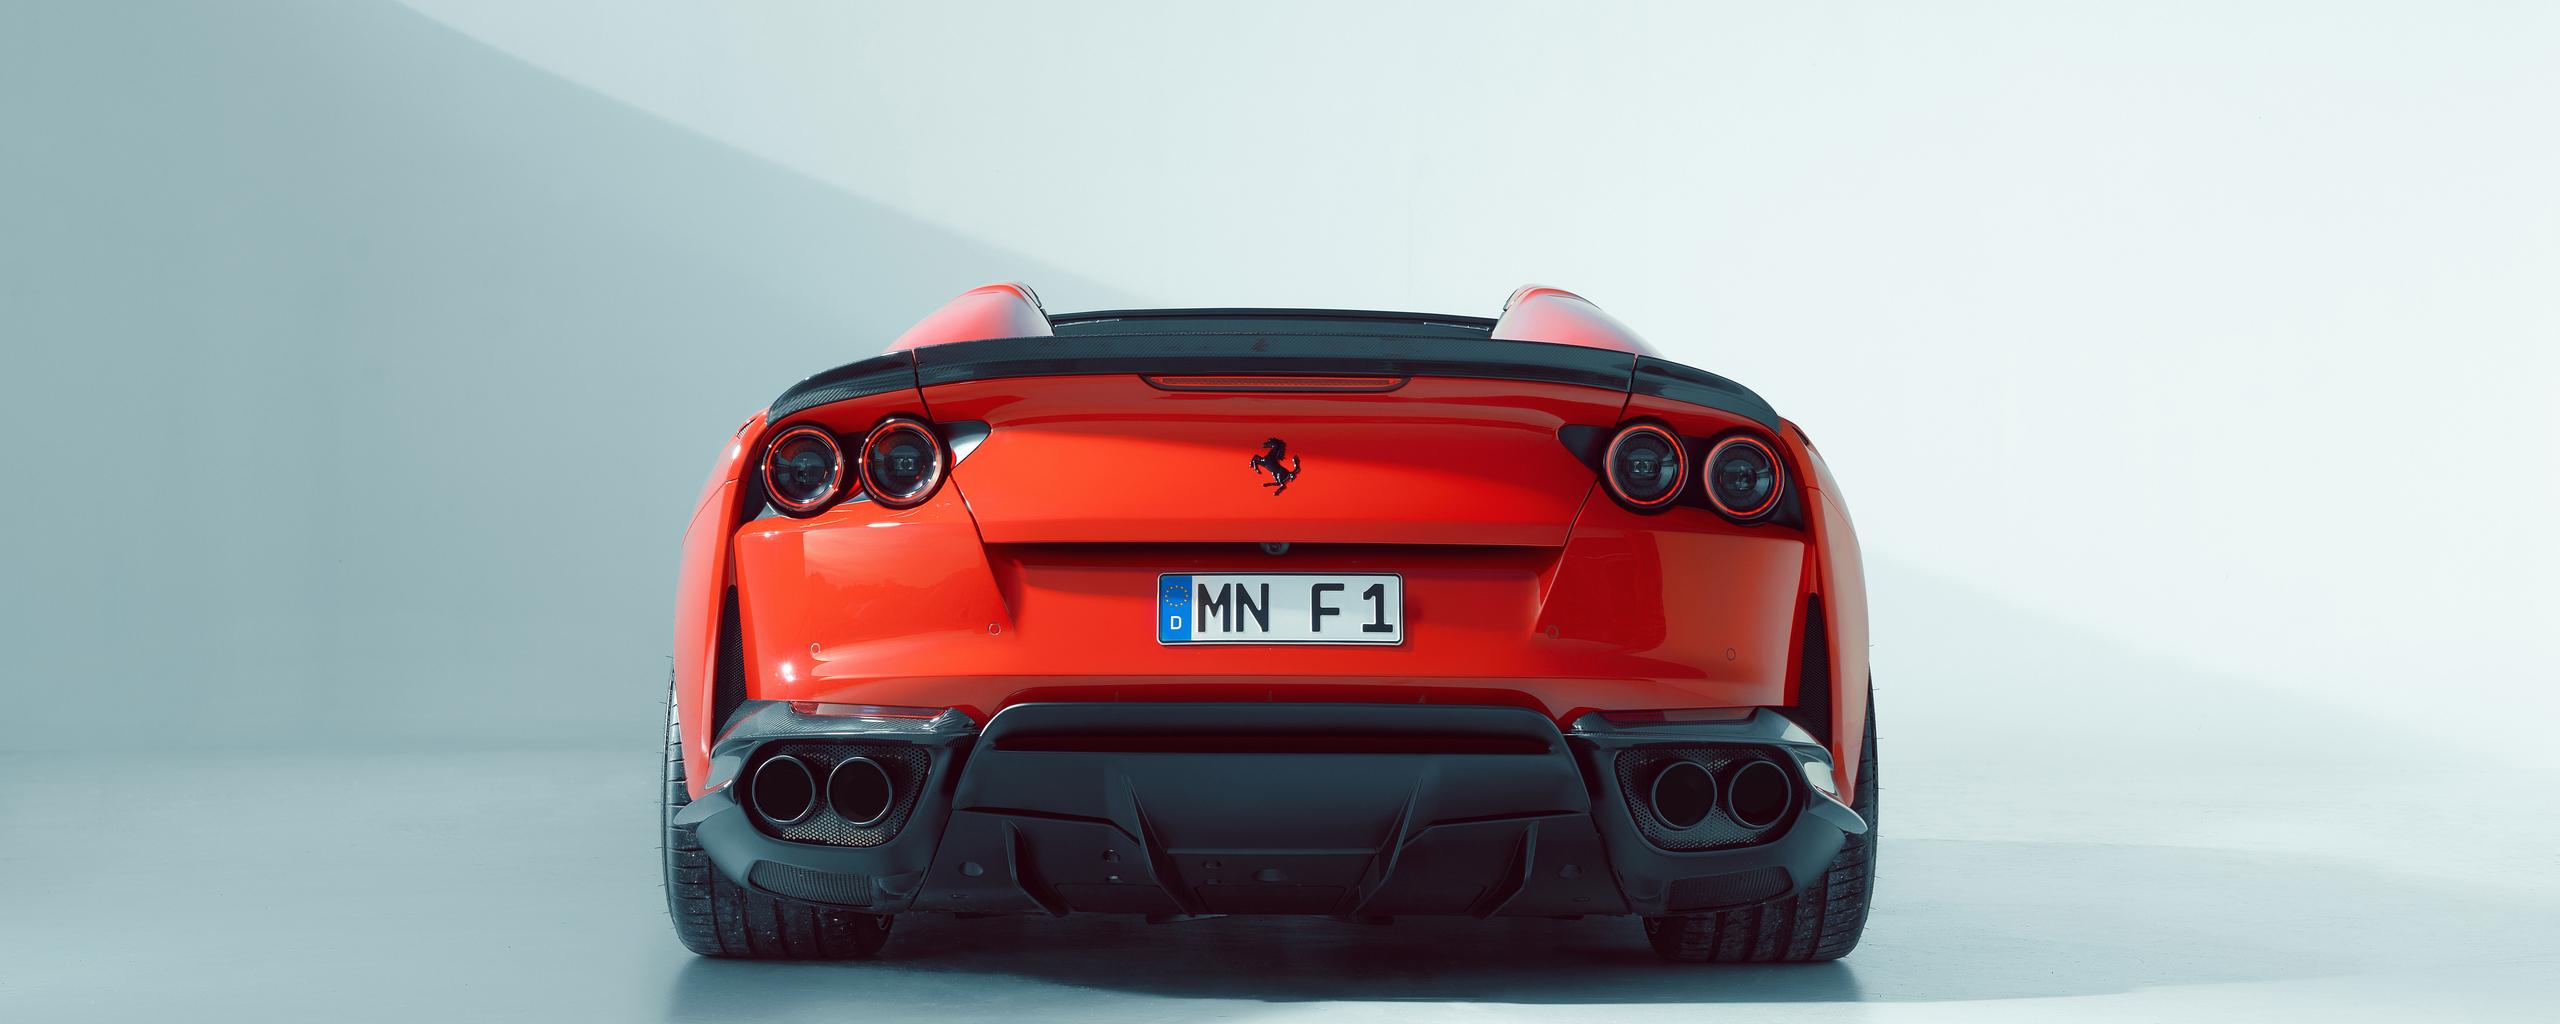 novitec-ferrari-812-gts-2021-rear-kv.jpg